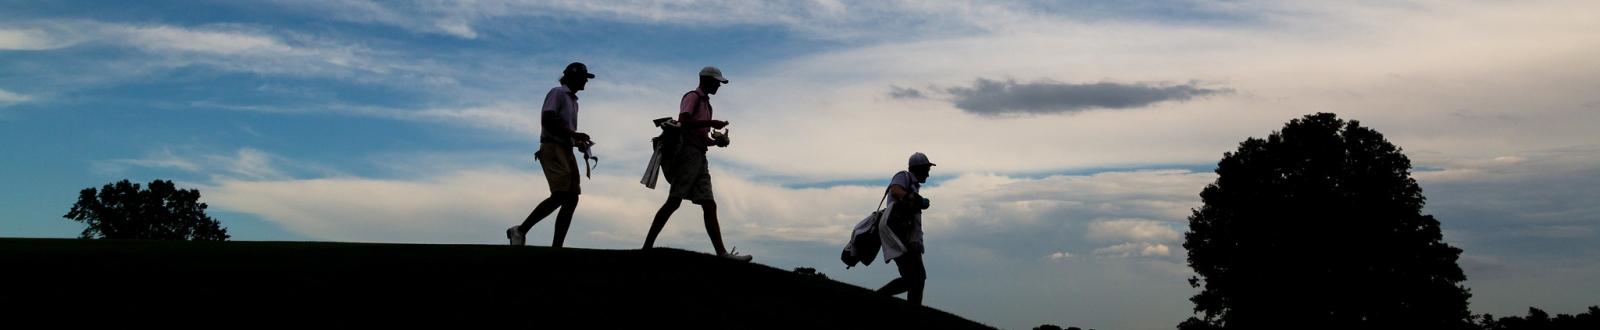 Golfers Walking down a tee box